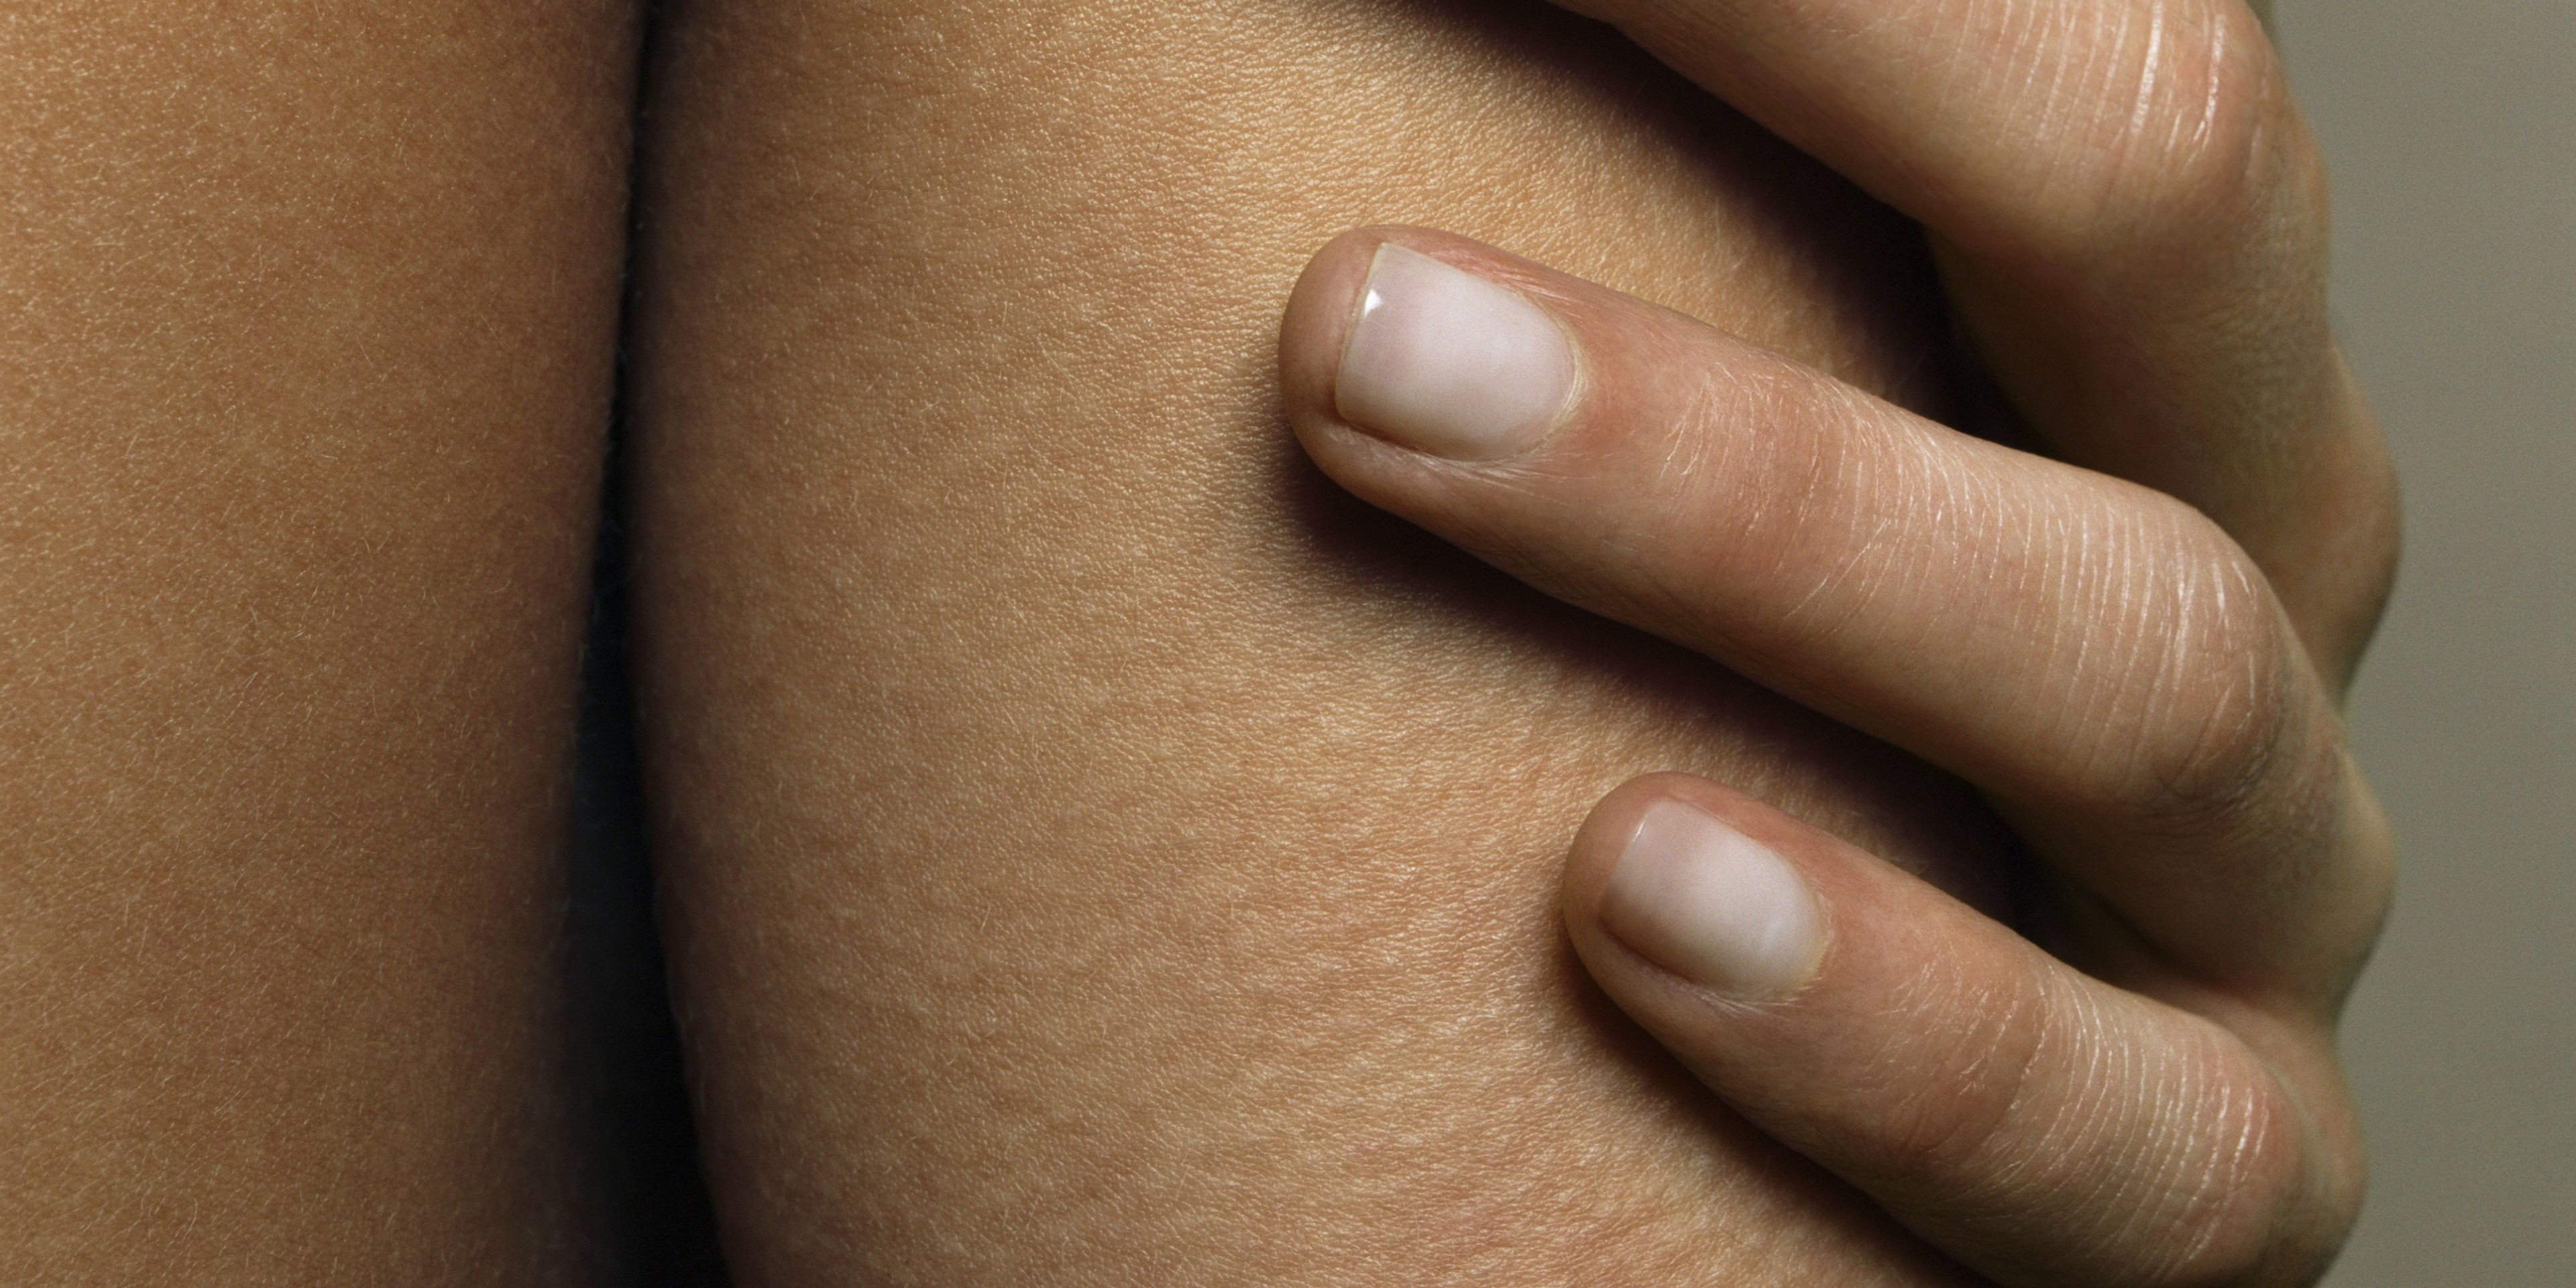 Nails after gel nails